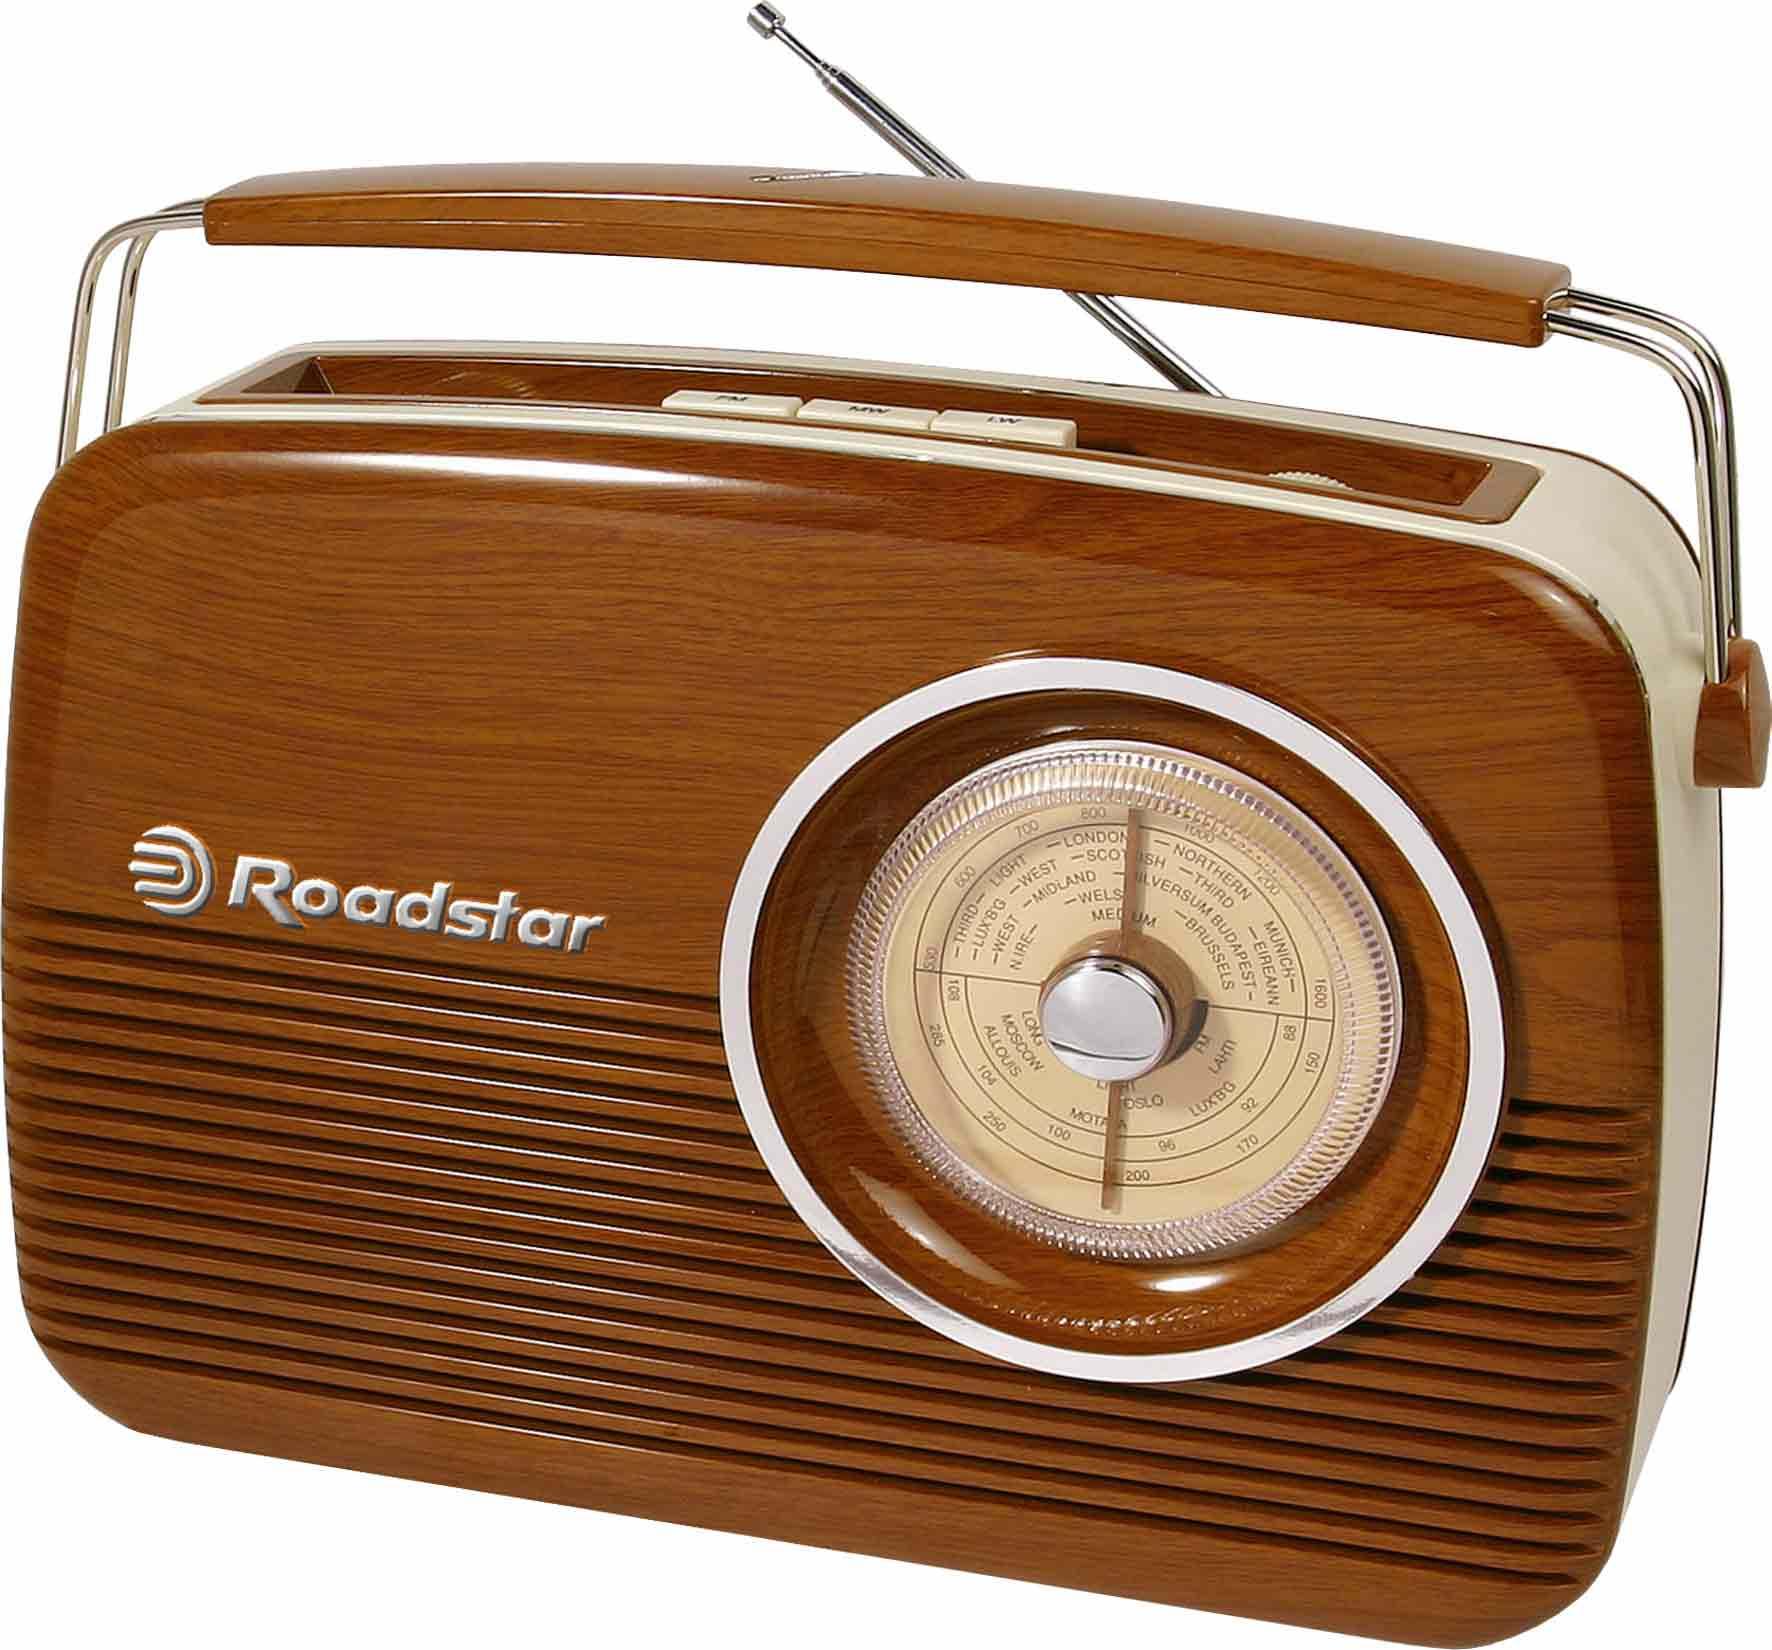 Roadstar Vintage line Trä FM